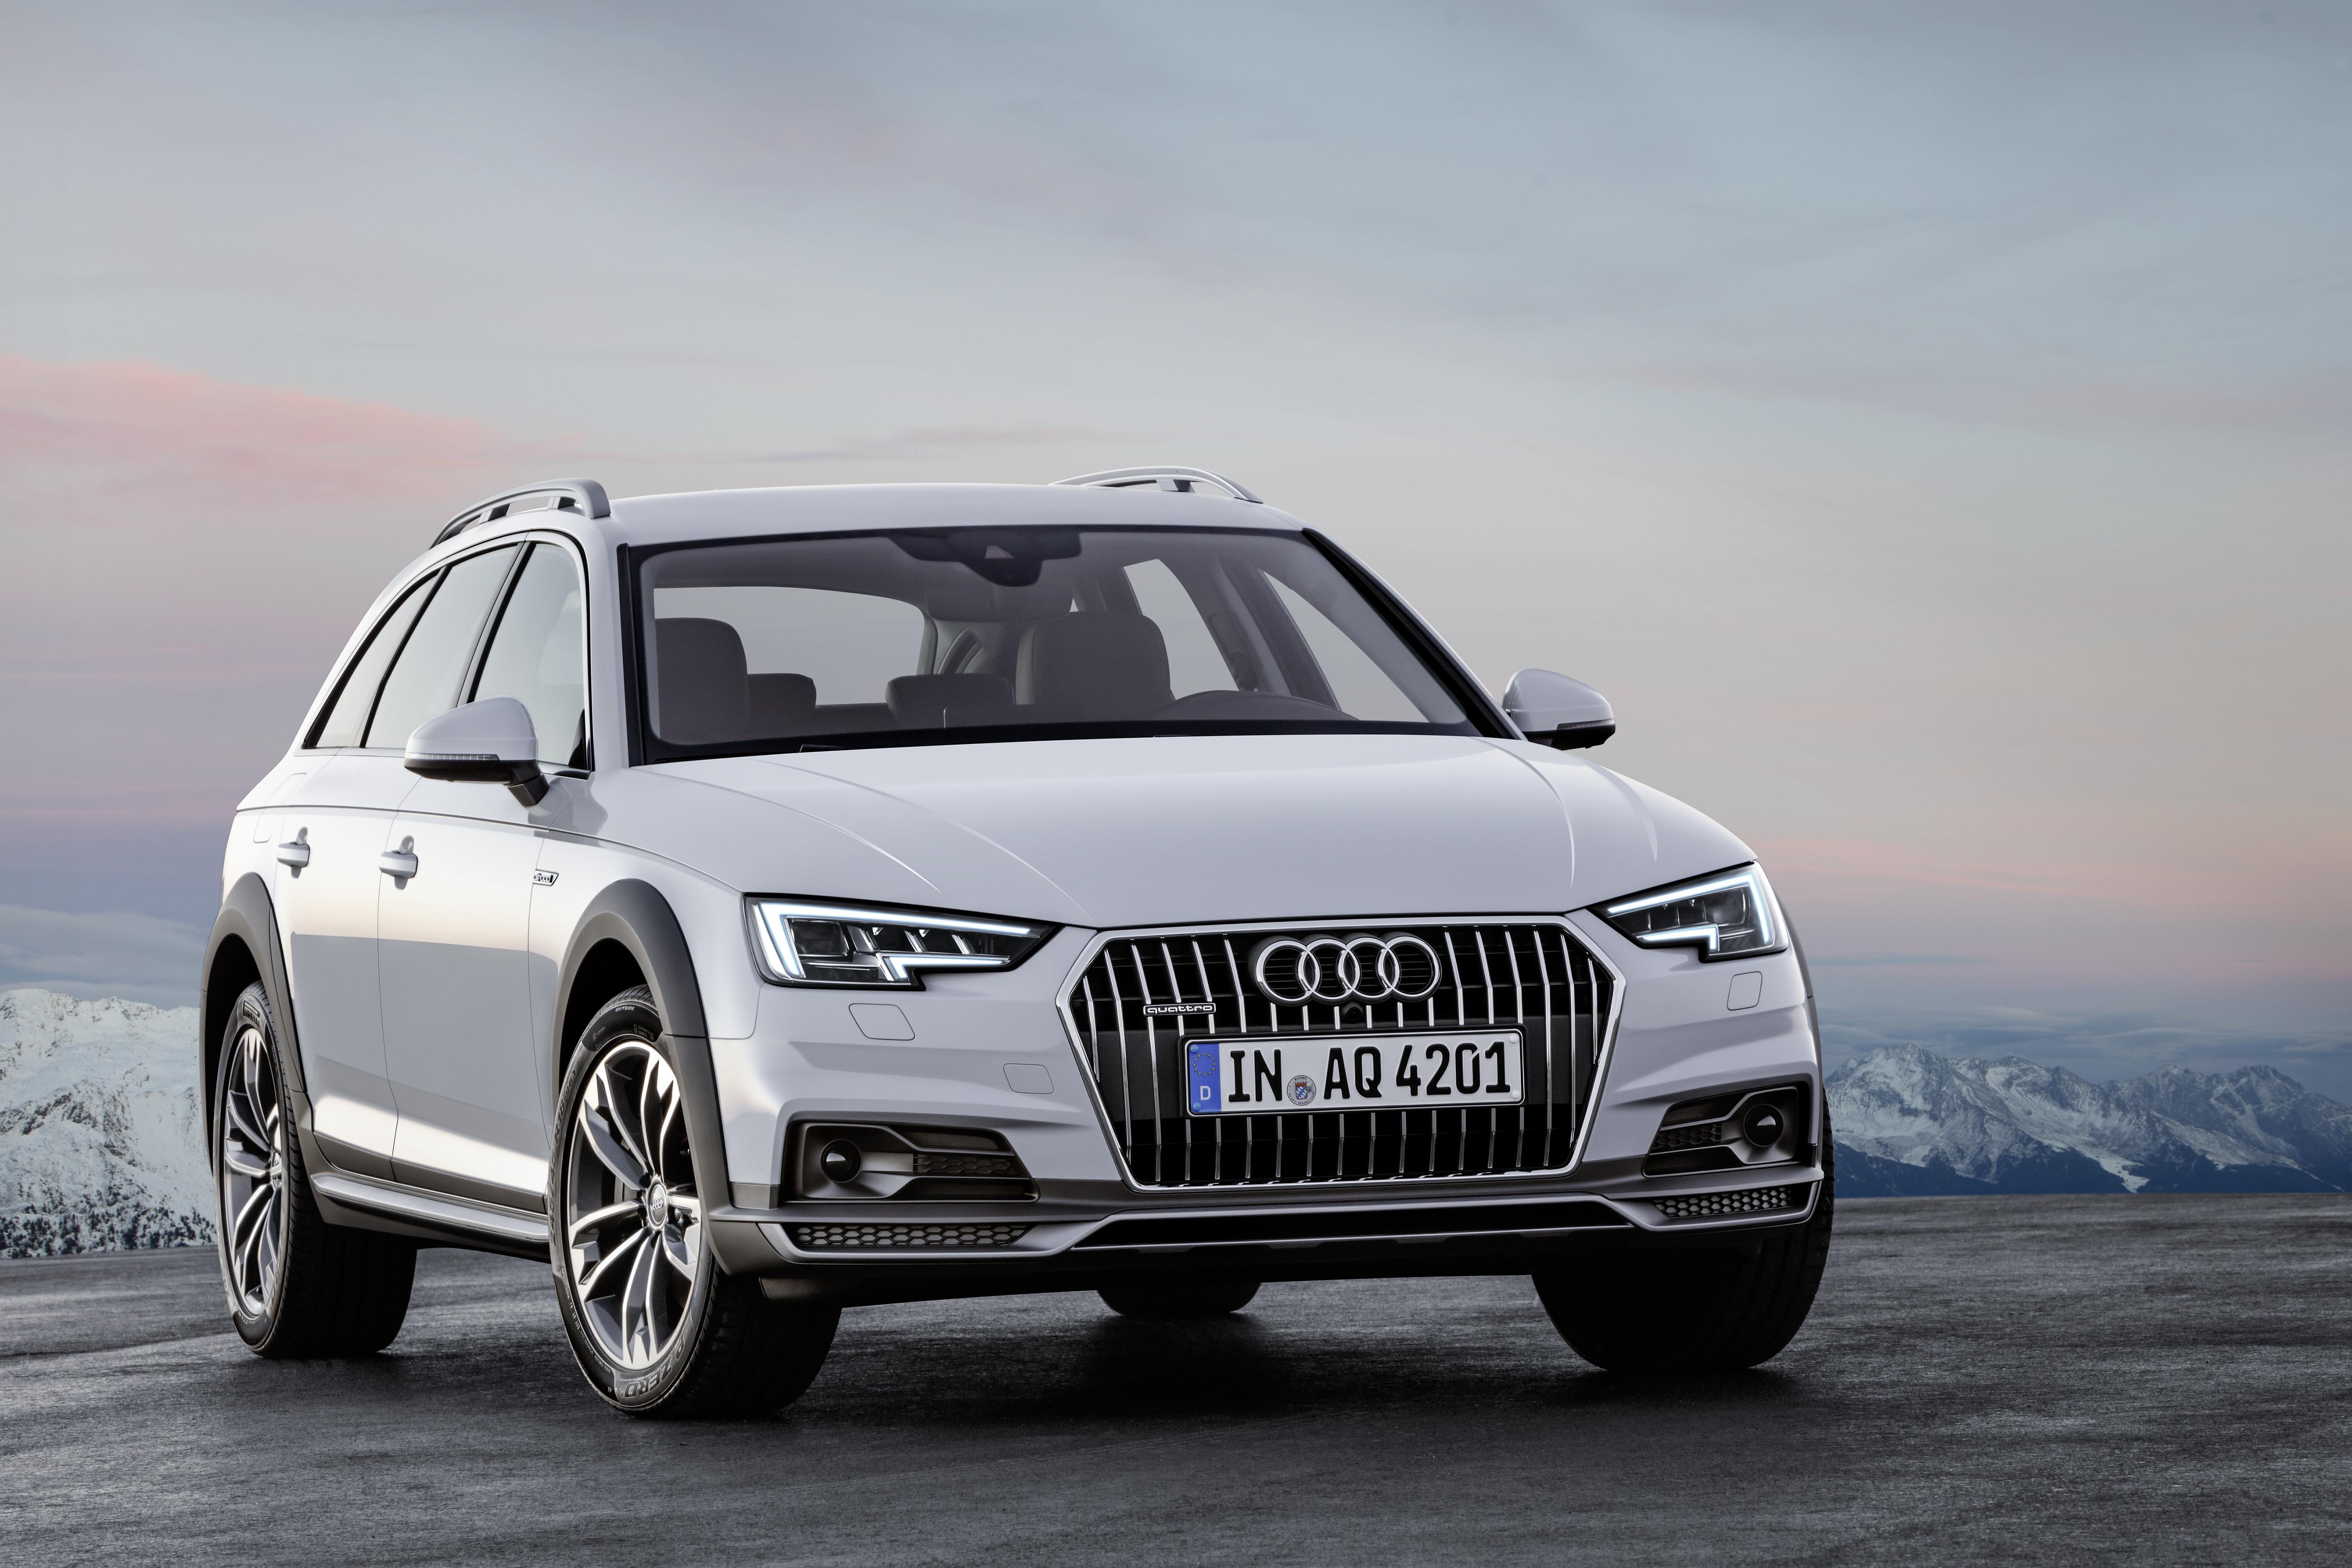 2018 Audi A4 Allroad Quattro 20 Tfsi Quattro 480427 Best Quality